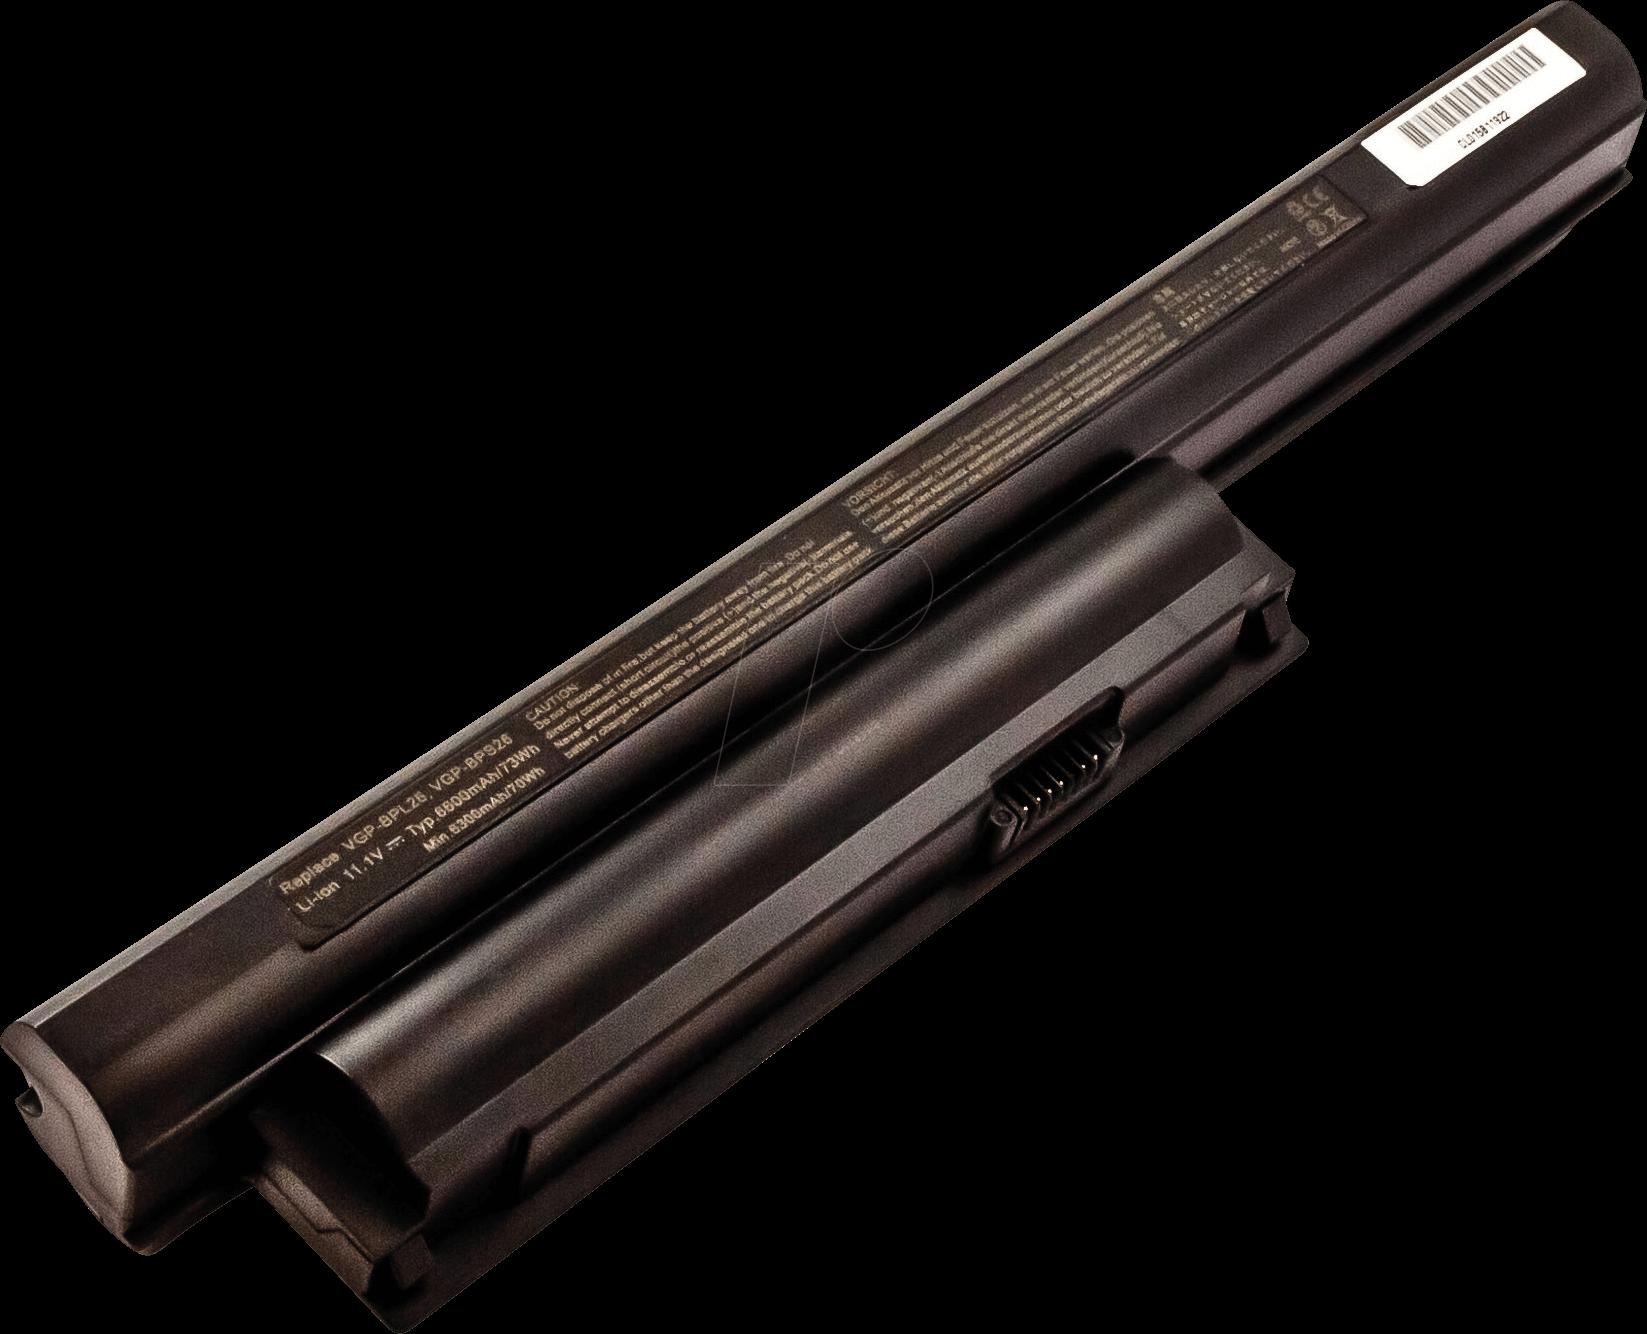 AKKU 53615 - Notebook-Akku für Sony, Li-Ion, 6600 mAh